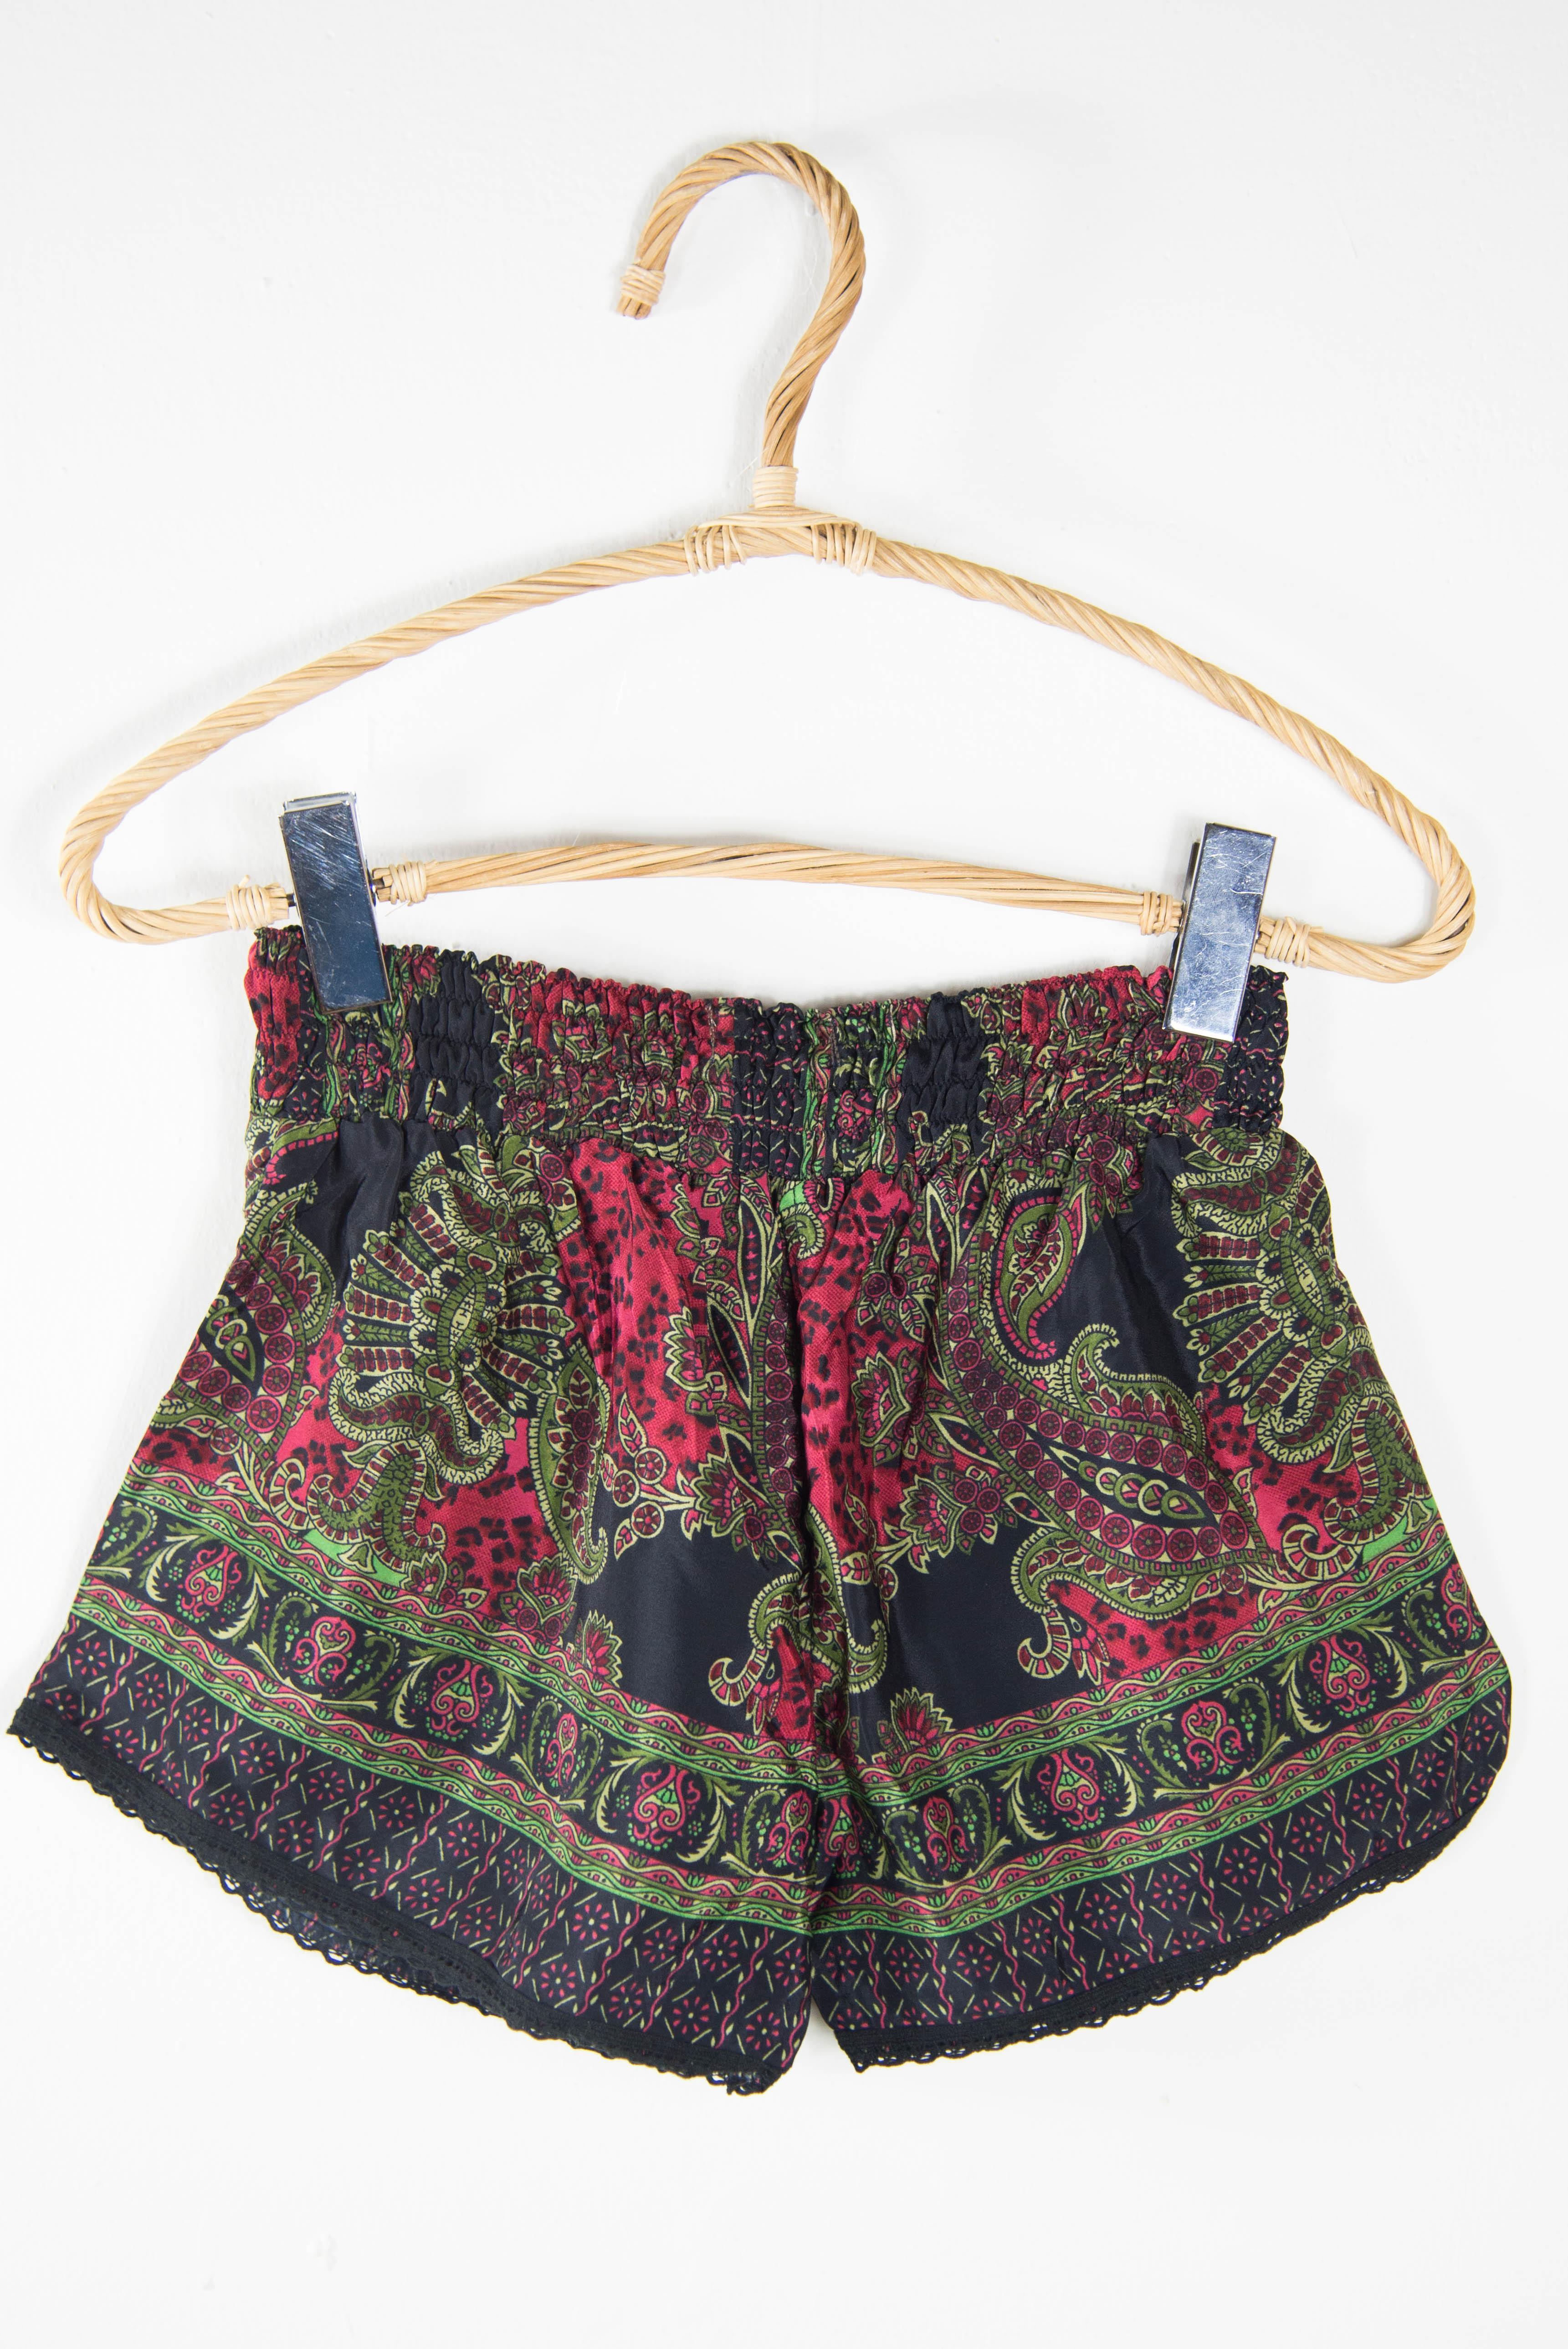 Pantalone donna corto | Pantaloncini compra on line